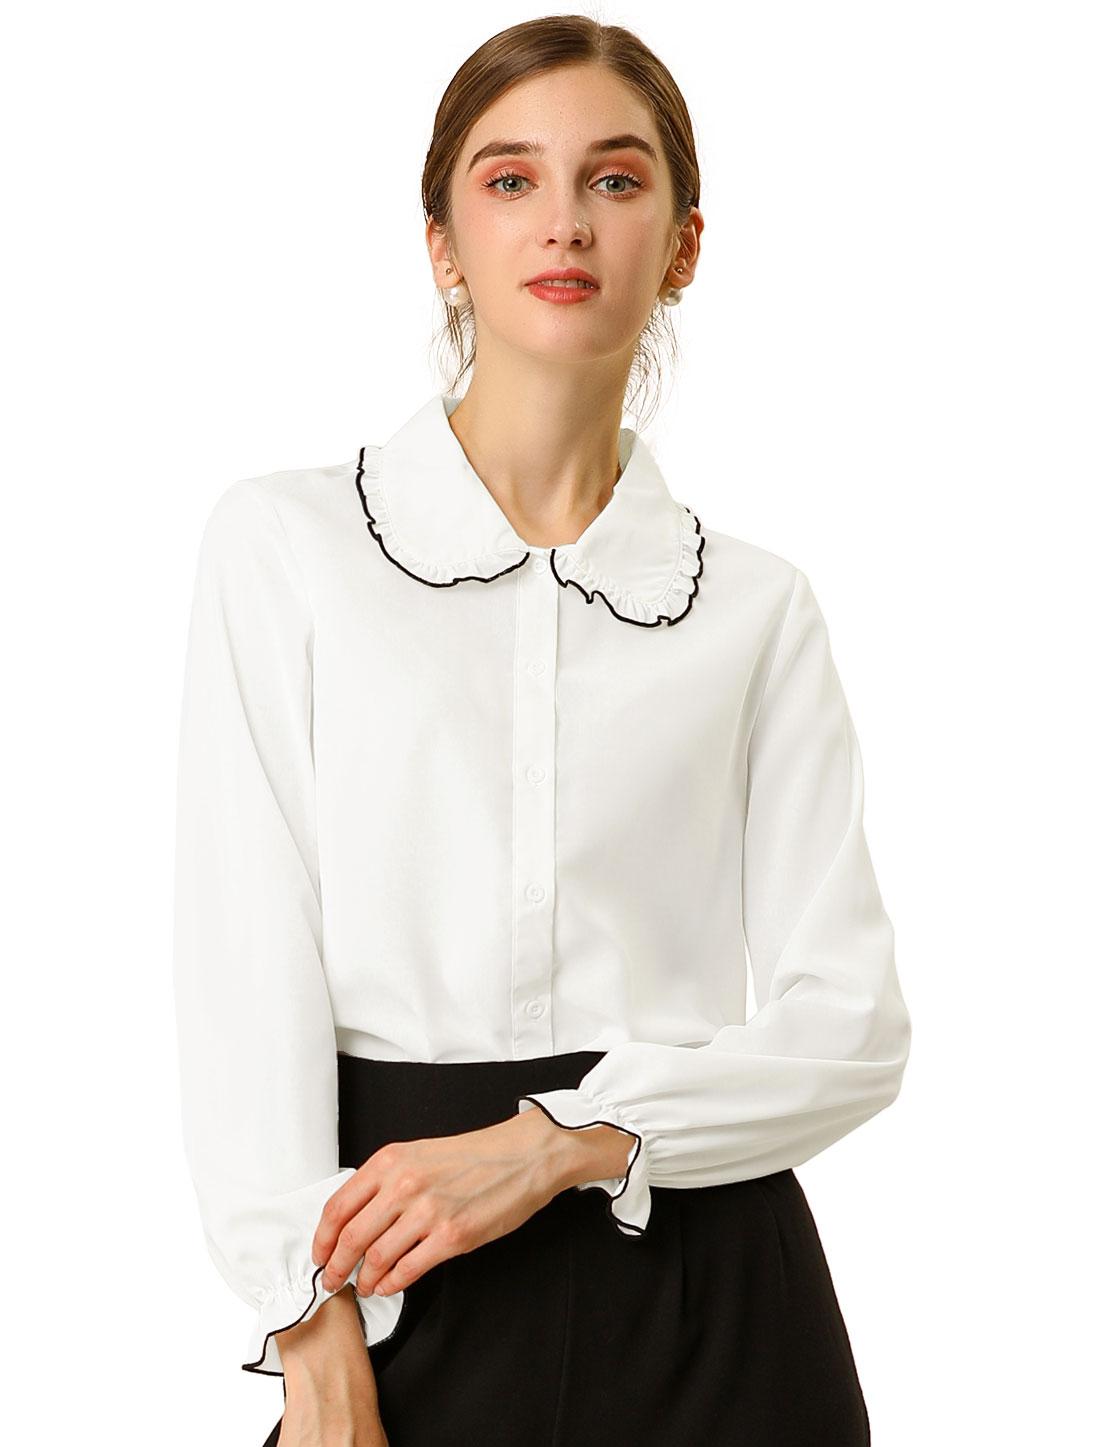 Women's Sweet Ruffle Peter Pan Collar Long Sleeves Button Up Shirt White XL